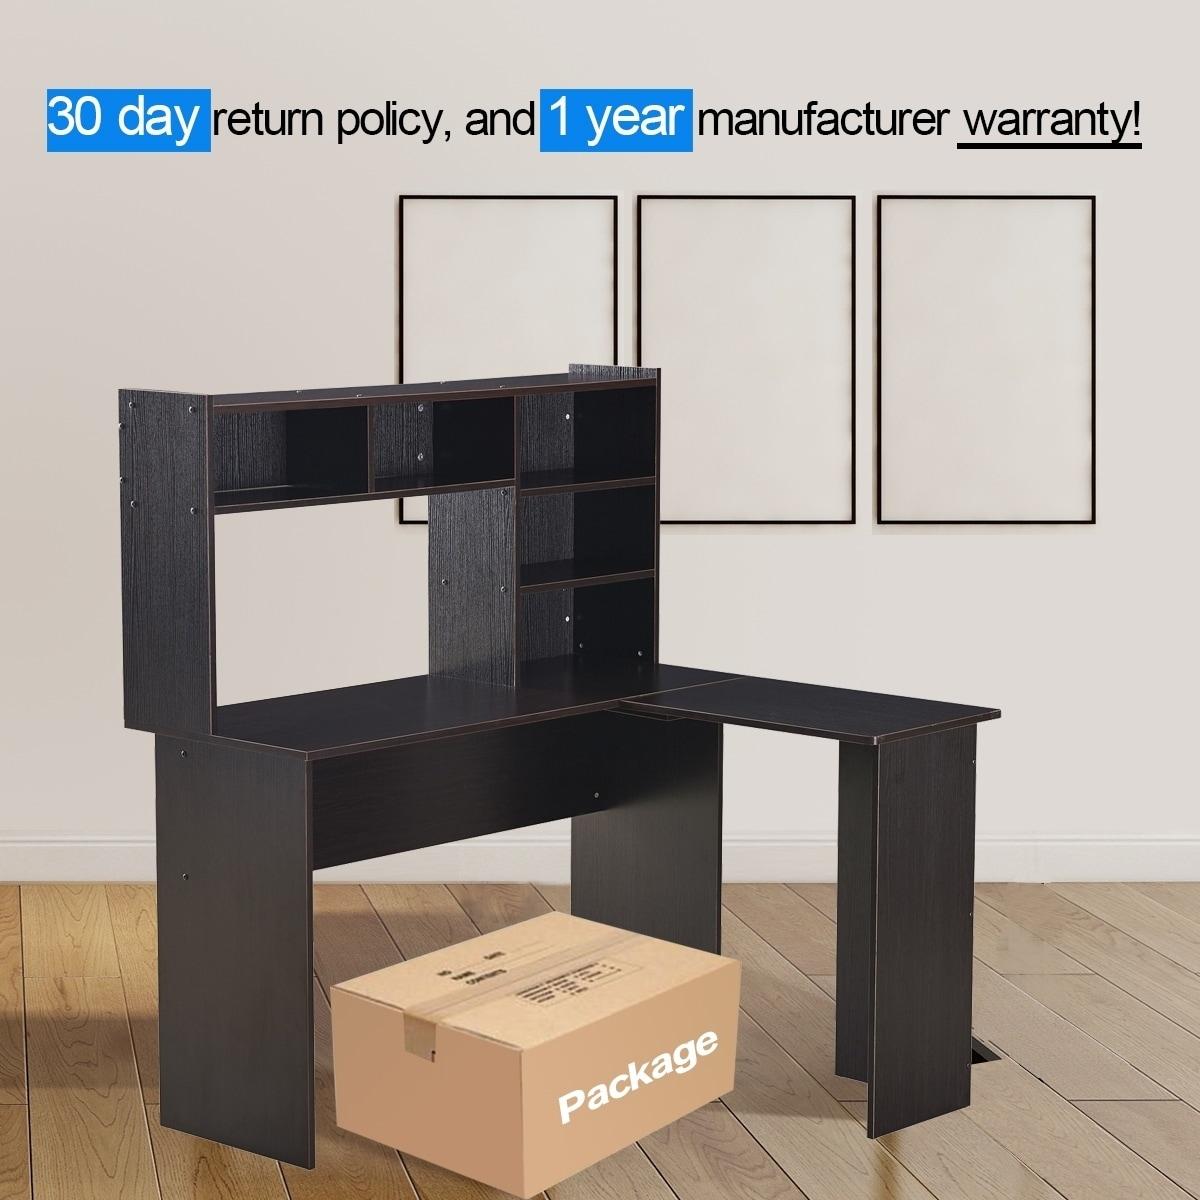 Shop Mcombo L Shaped Desk Corner Desk Home Office Workstation   Free  Shipping Today   Overstock.com   23107875